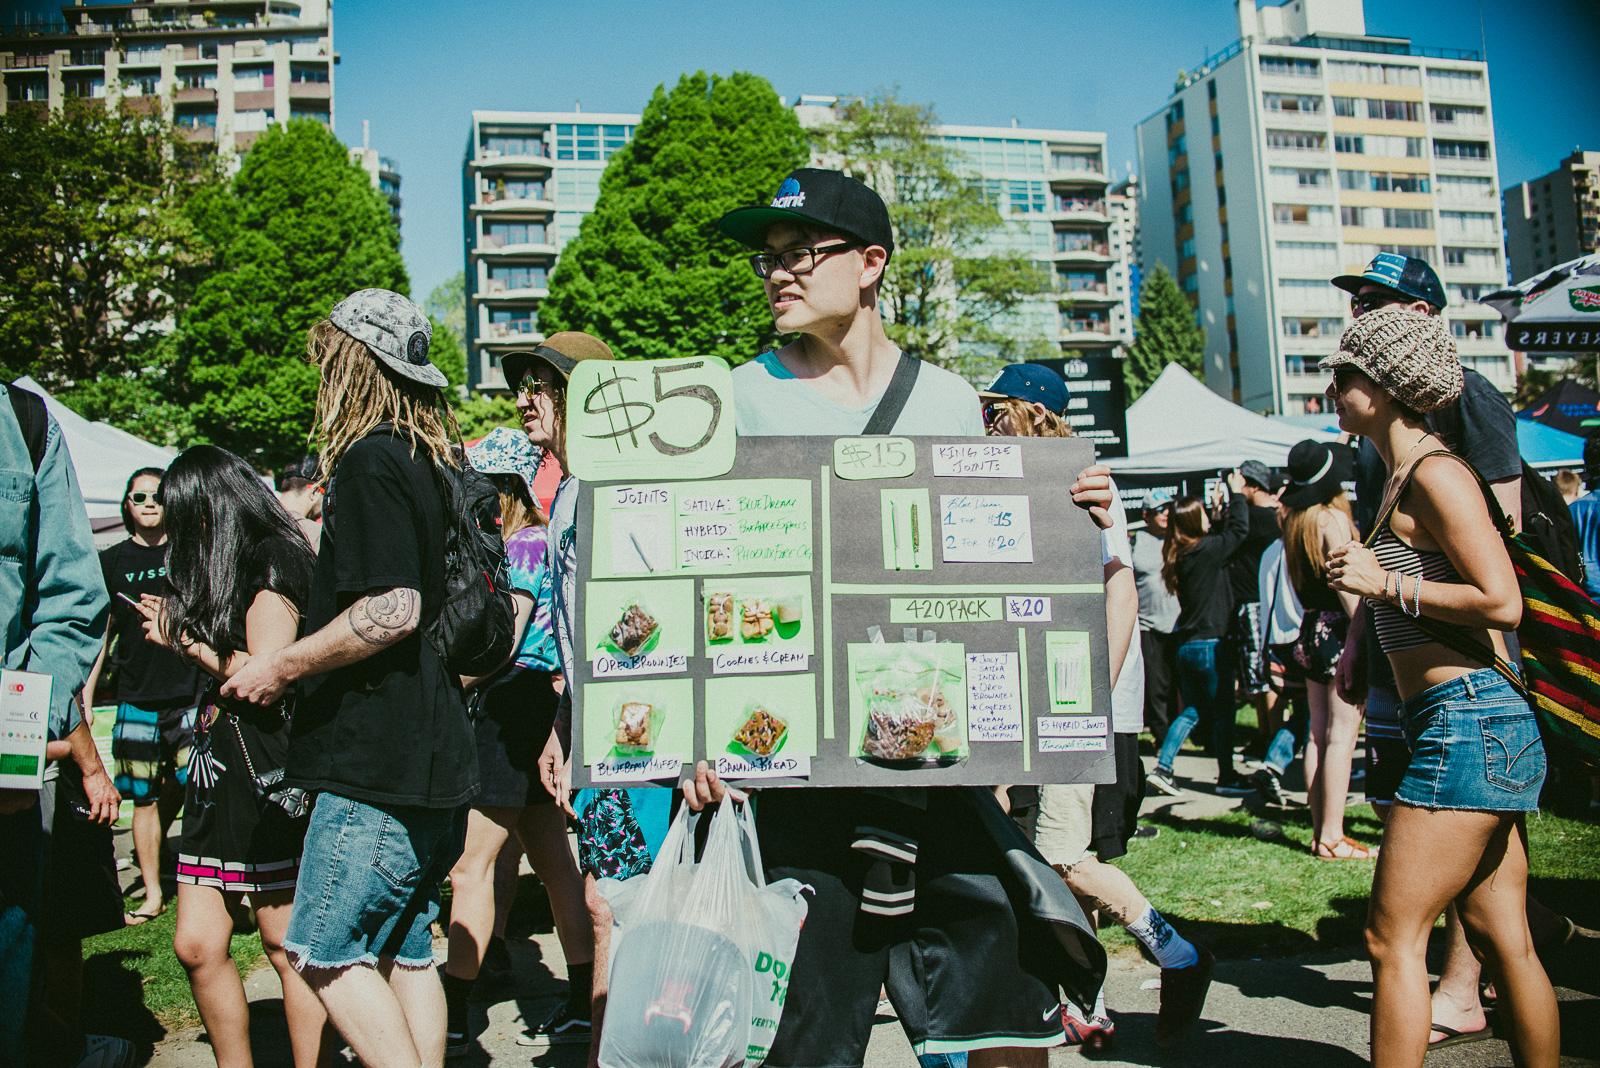 420_Sunset_Beach_Vancouver_2016_Timothy_nguyen (4 of 22).jpg